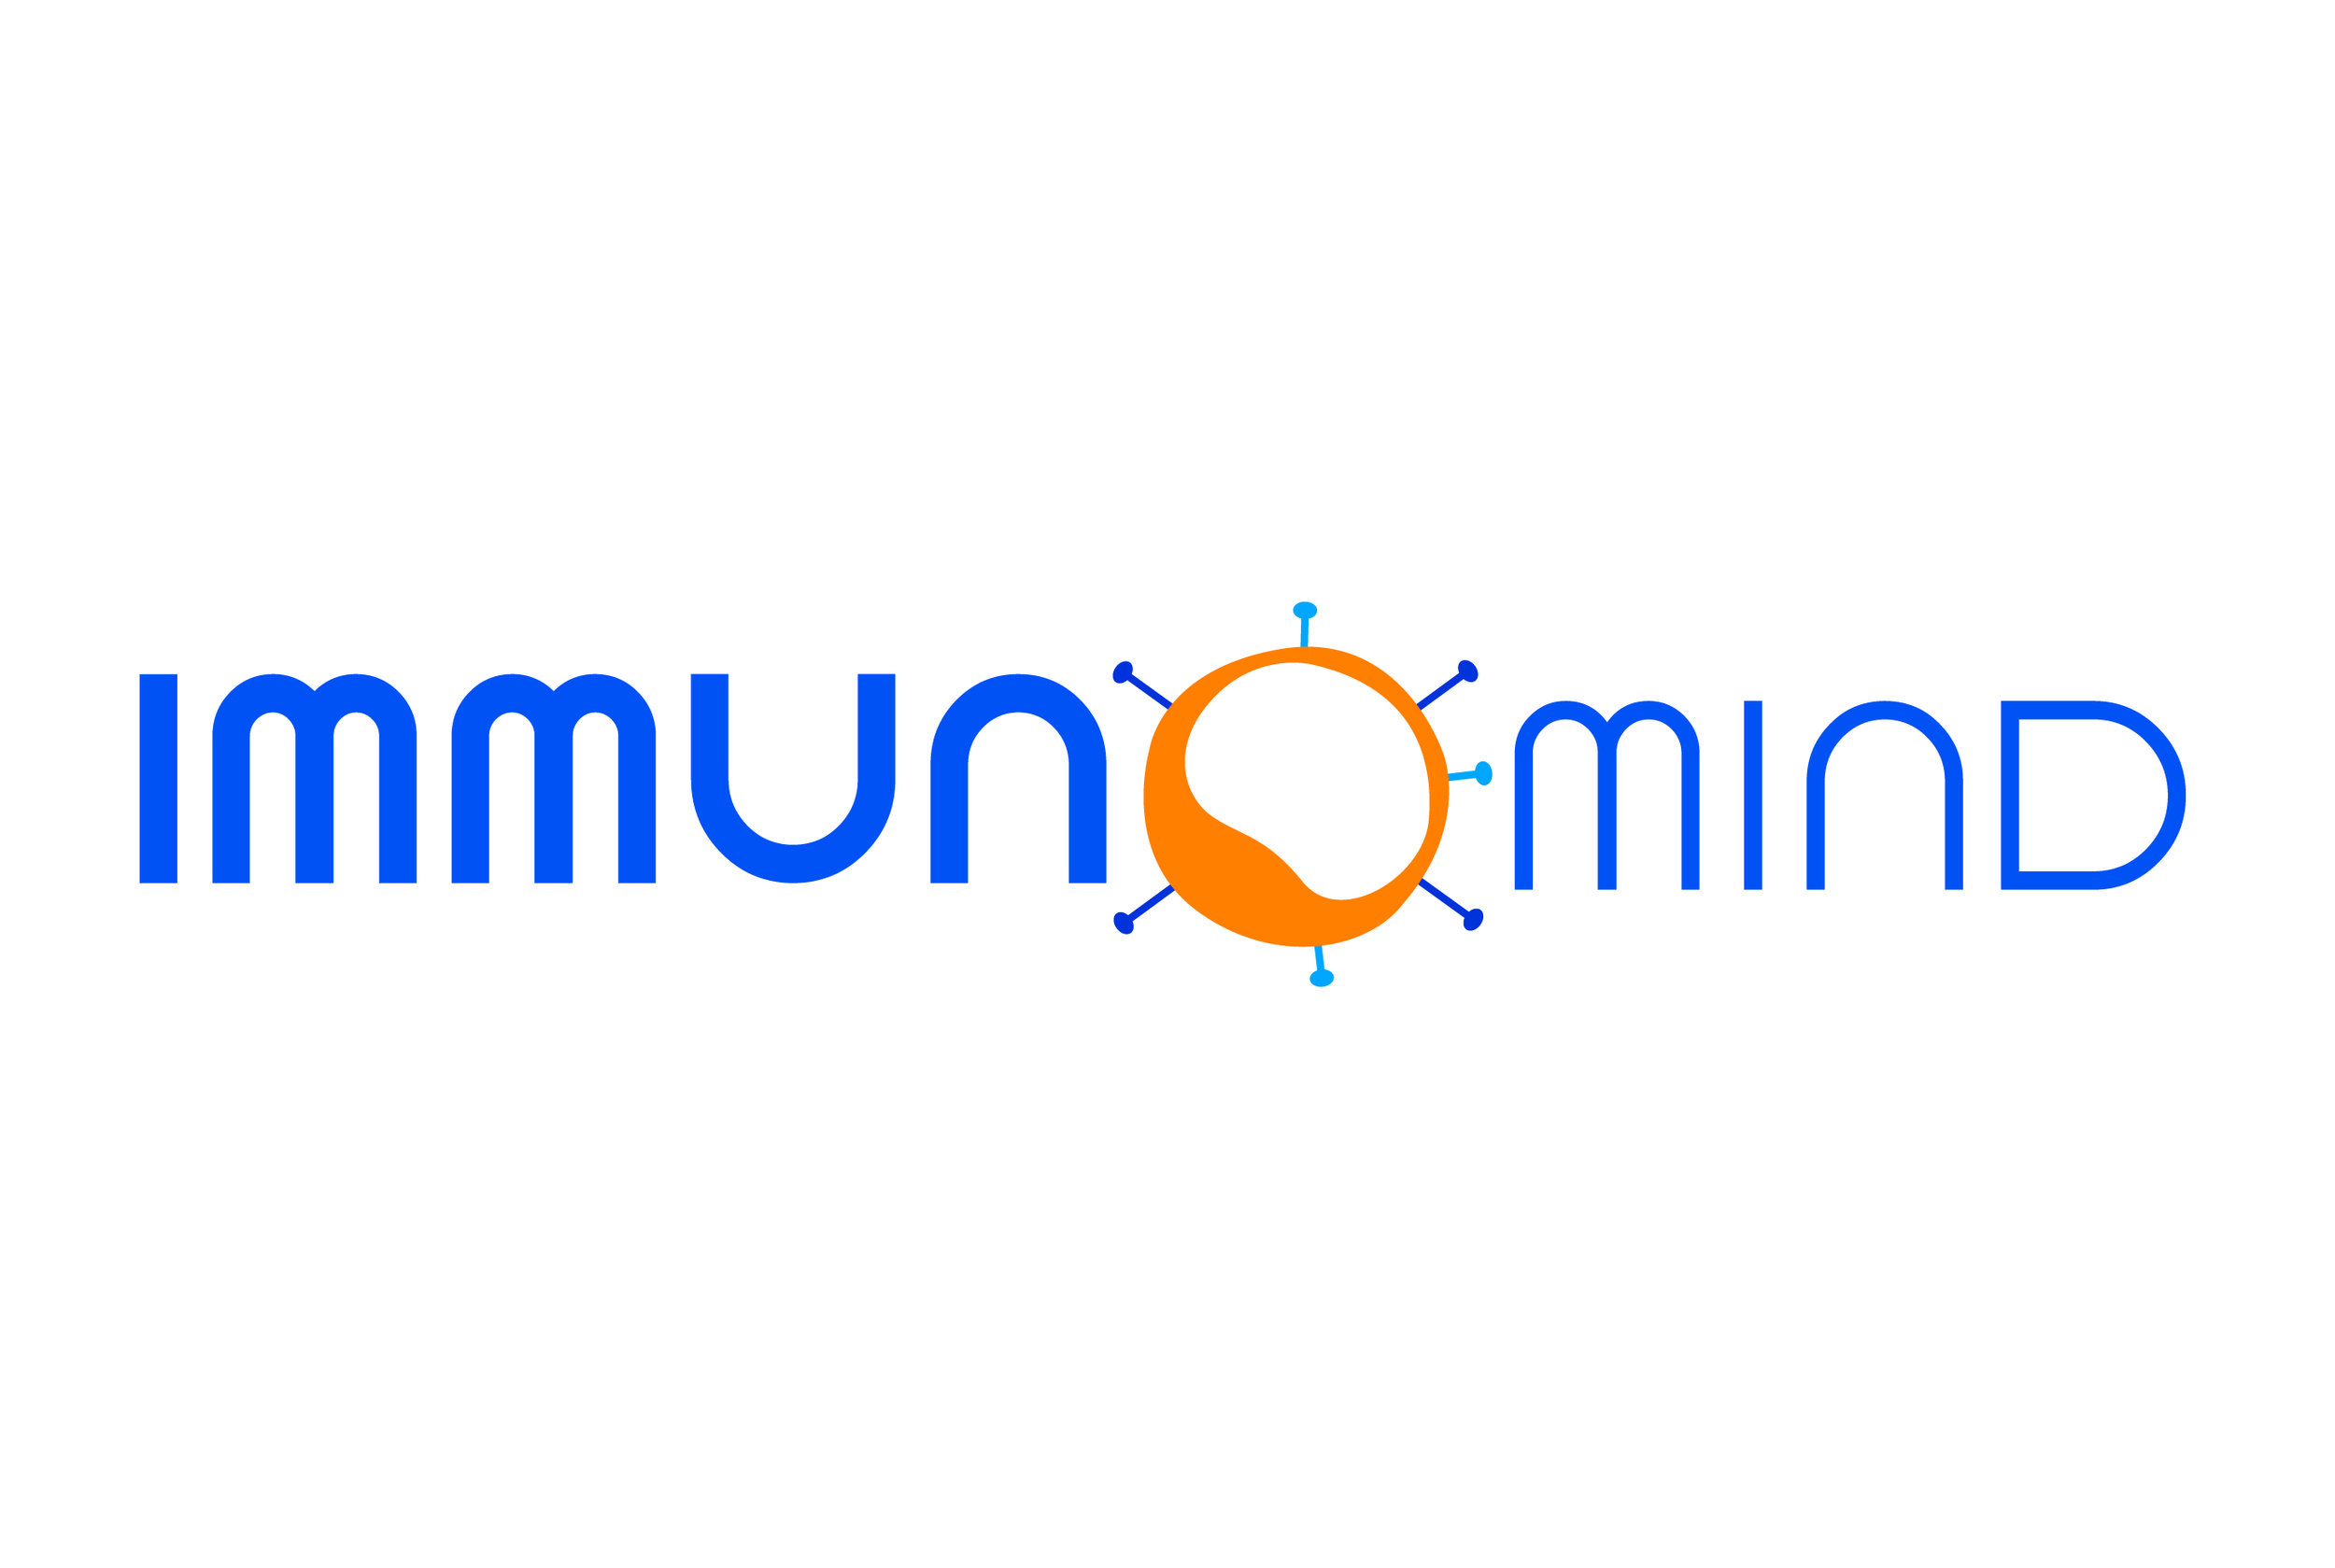 ImunnoMind_FullColour2.jpg